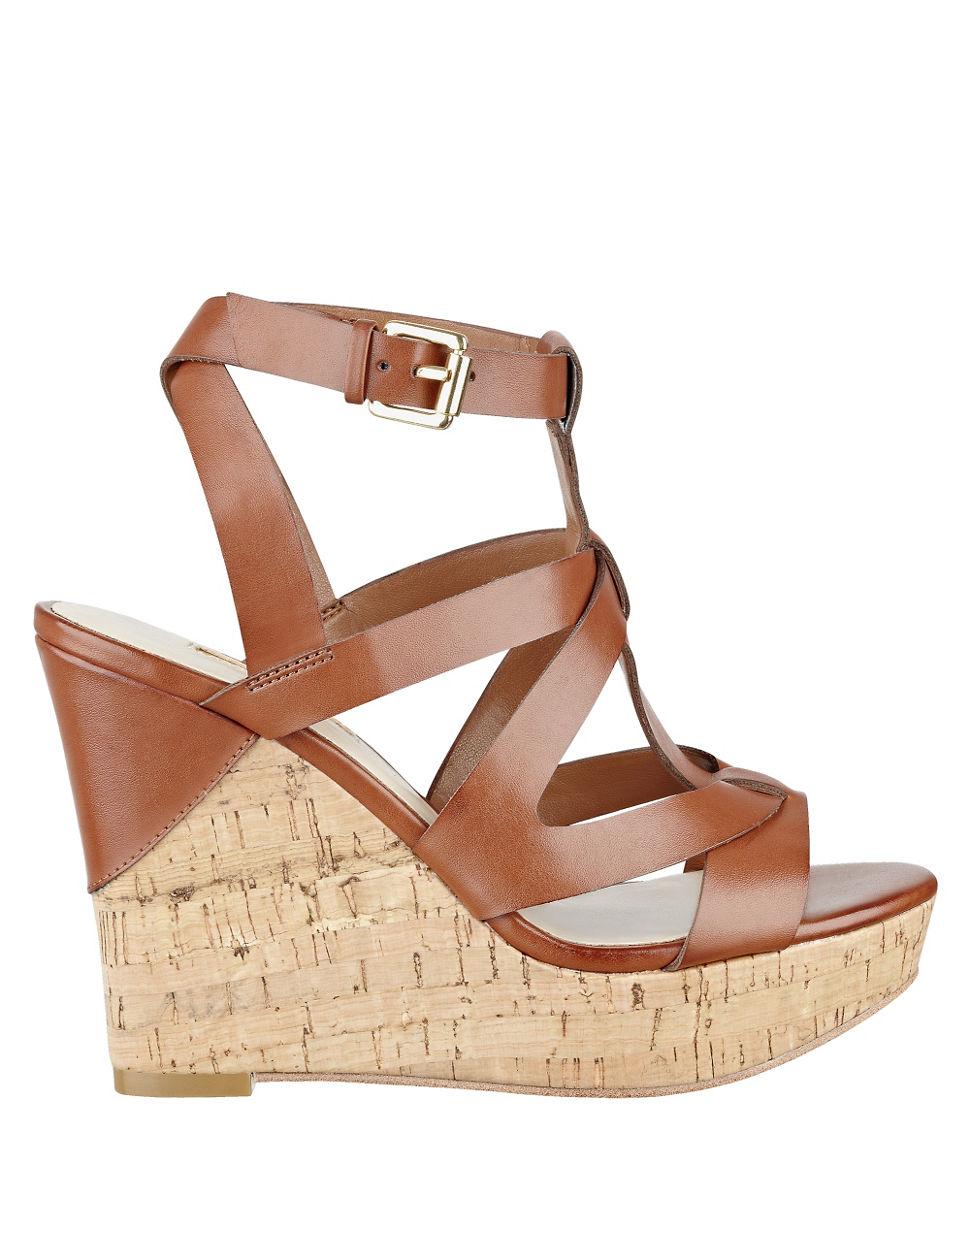 Guess Harlea Platform Wedge Sandals in Metallic